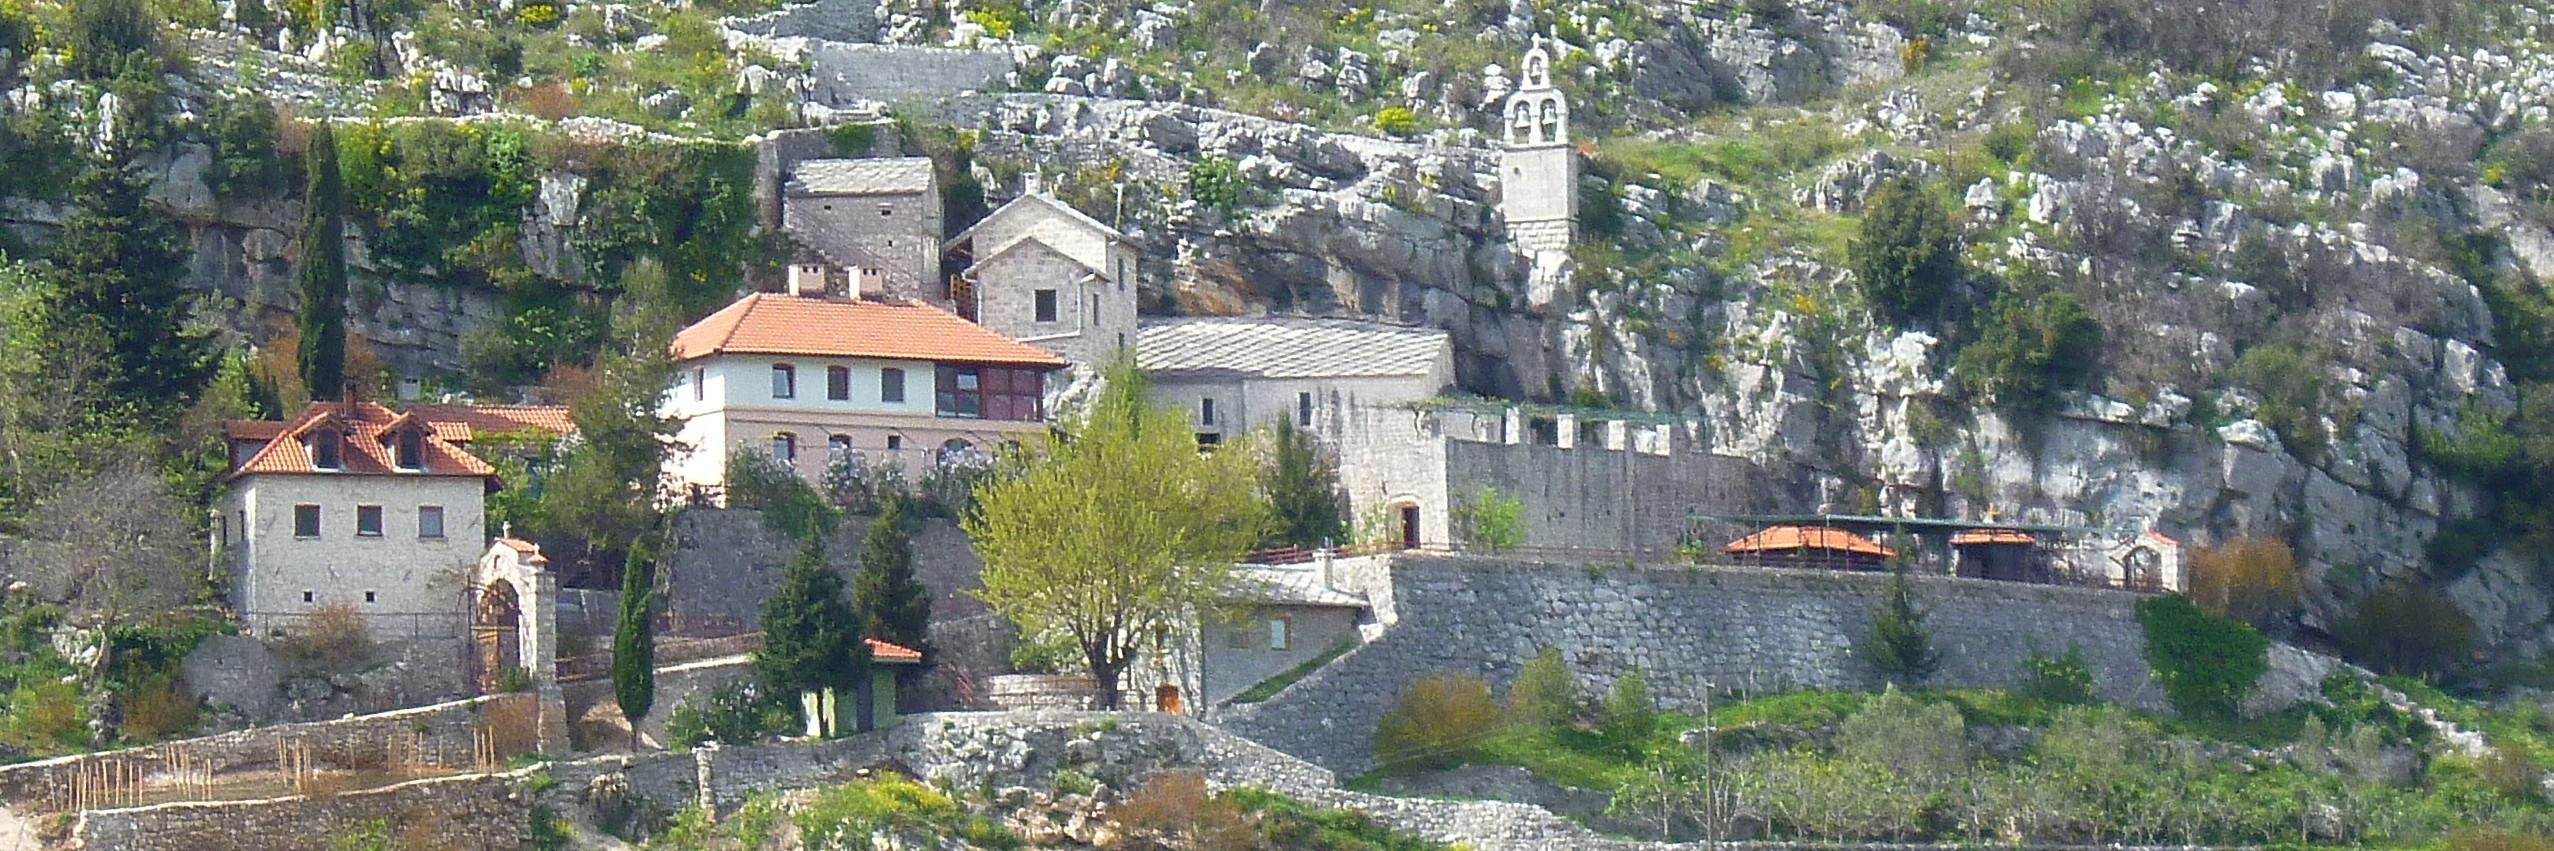 Монастырь Завала